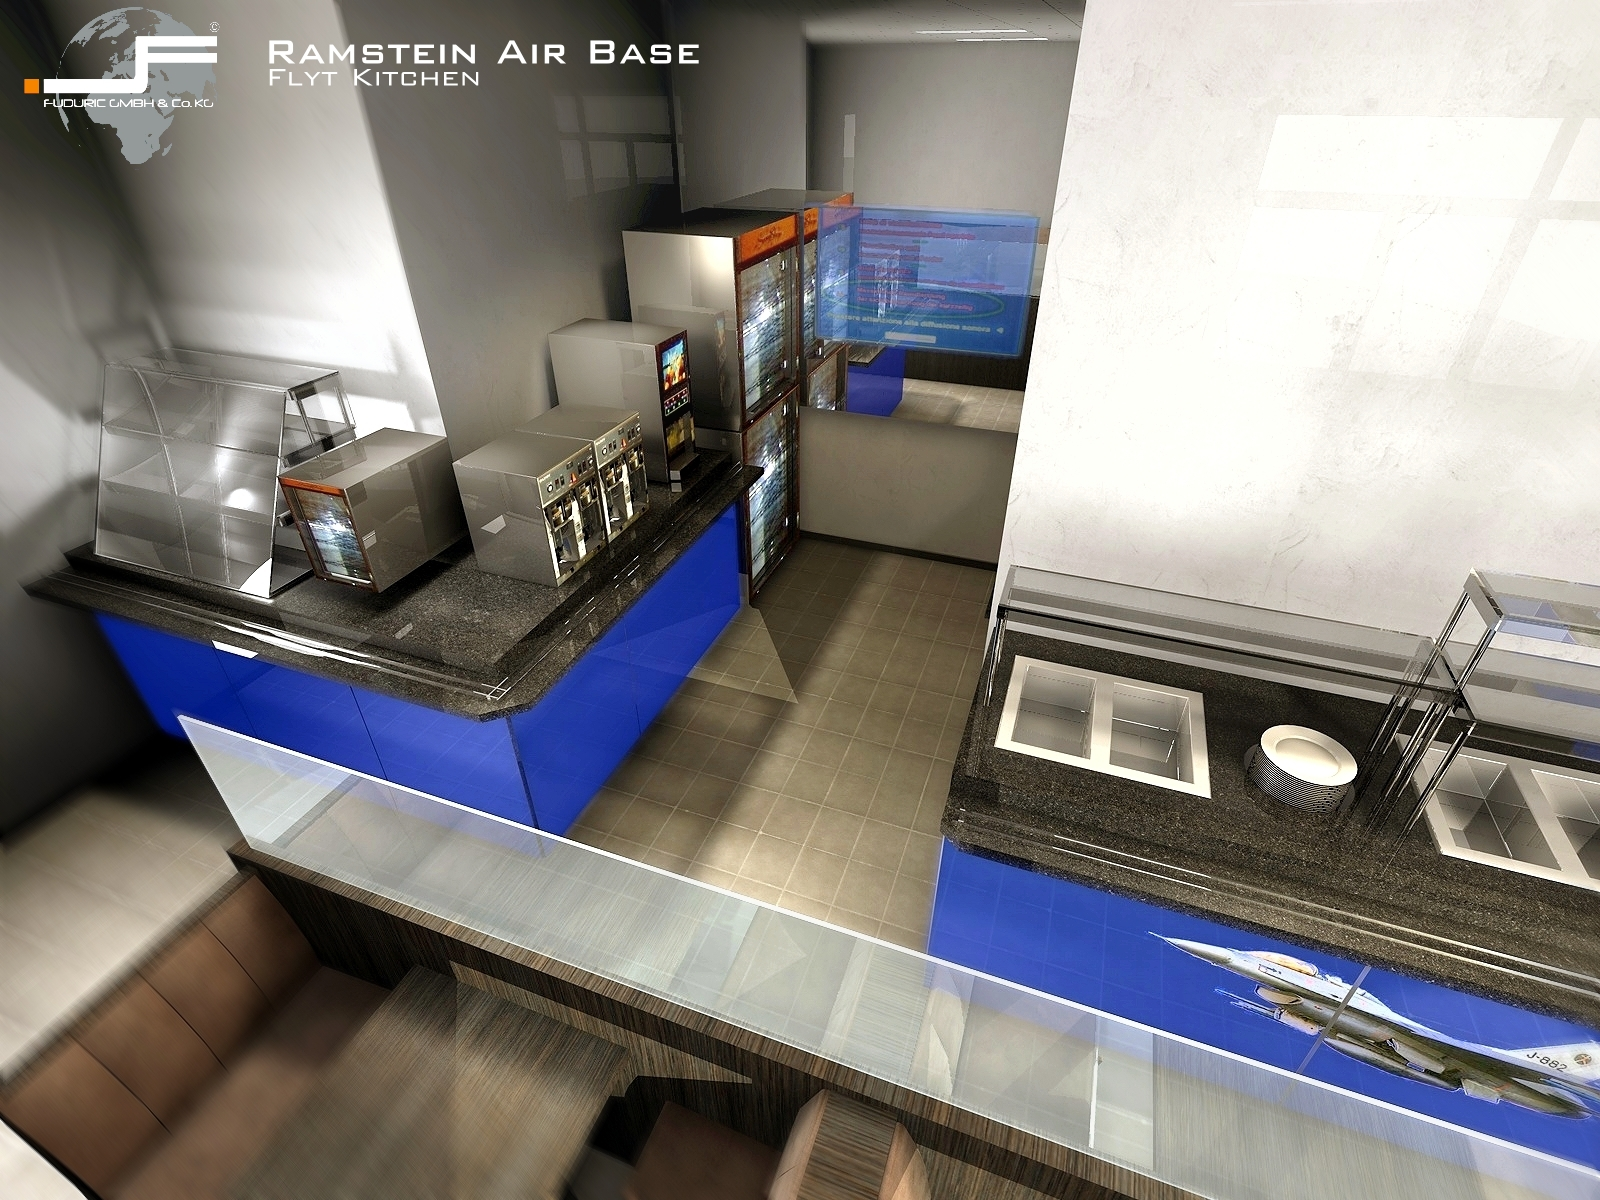 fuduric gmbh co kg official site. Black Bedroom Furniture Sets. Home Design Ideas